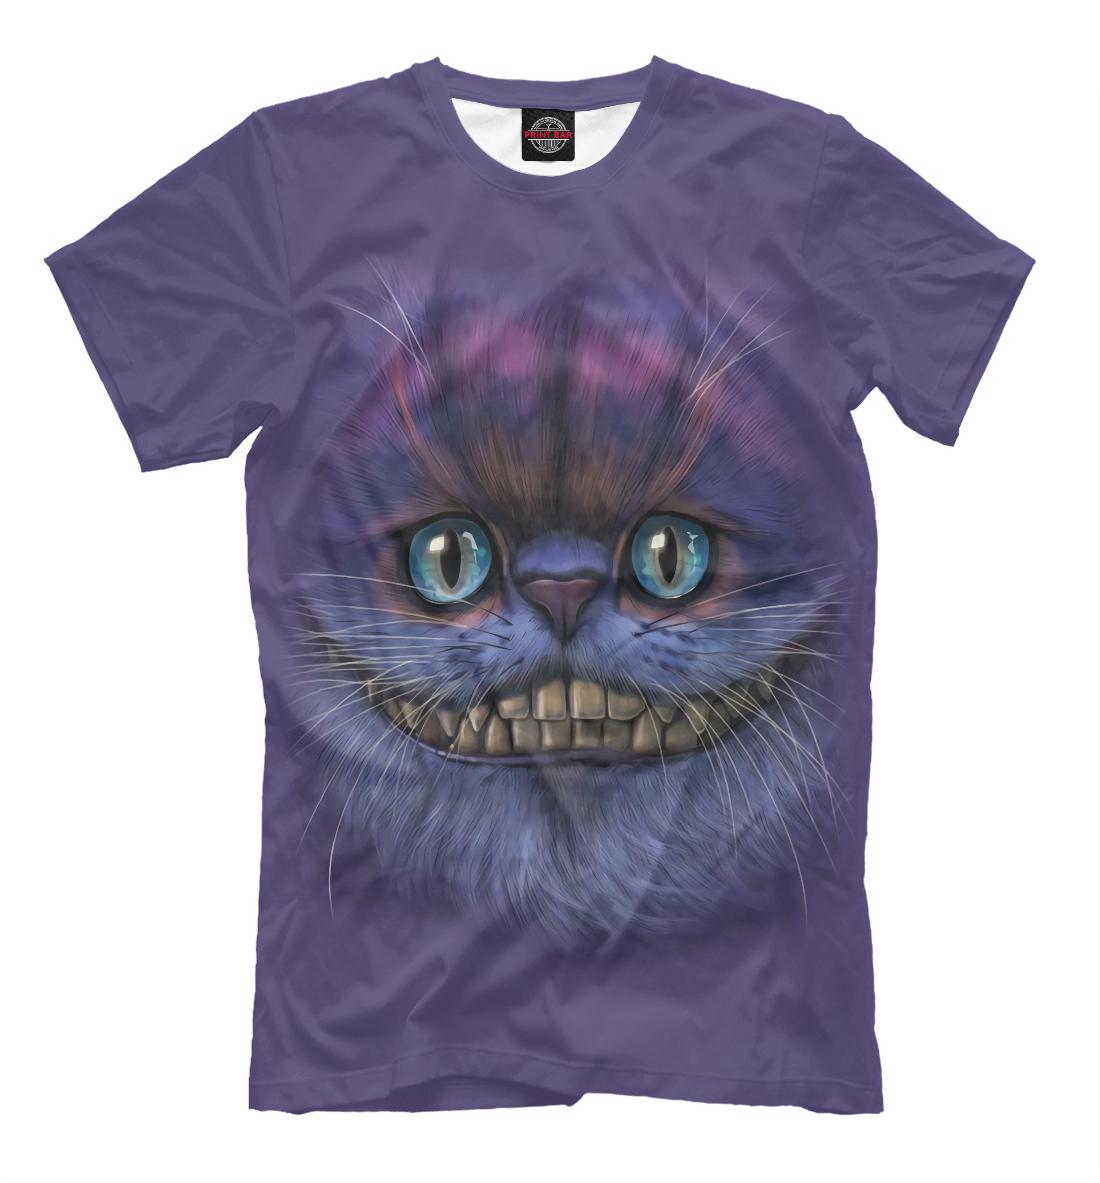 картинки футболка котика игромана настолько удалось вжиться